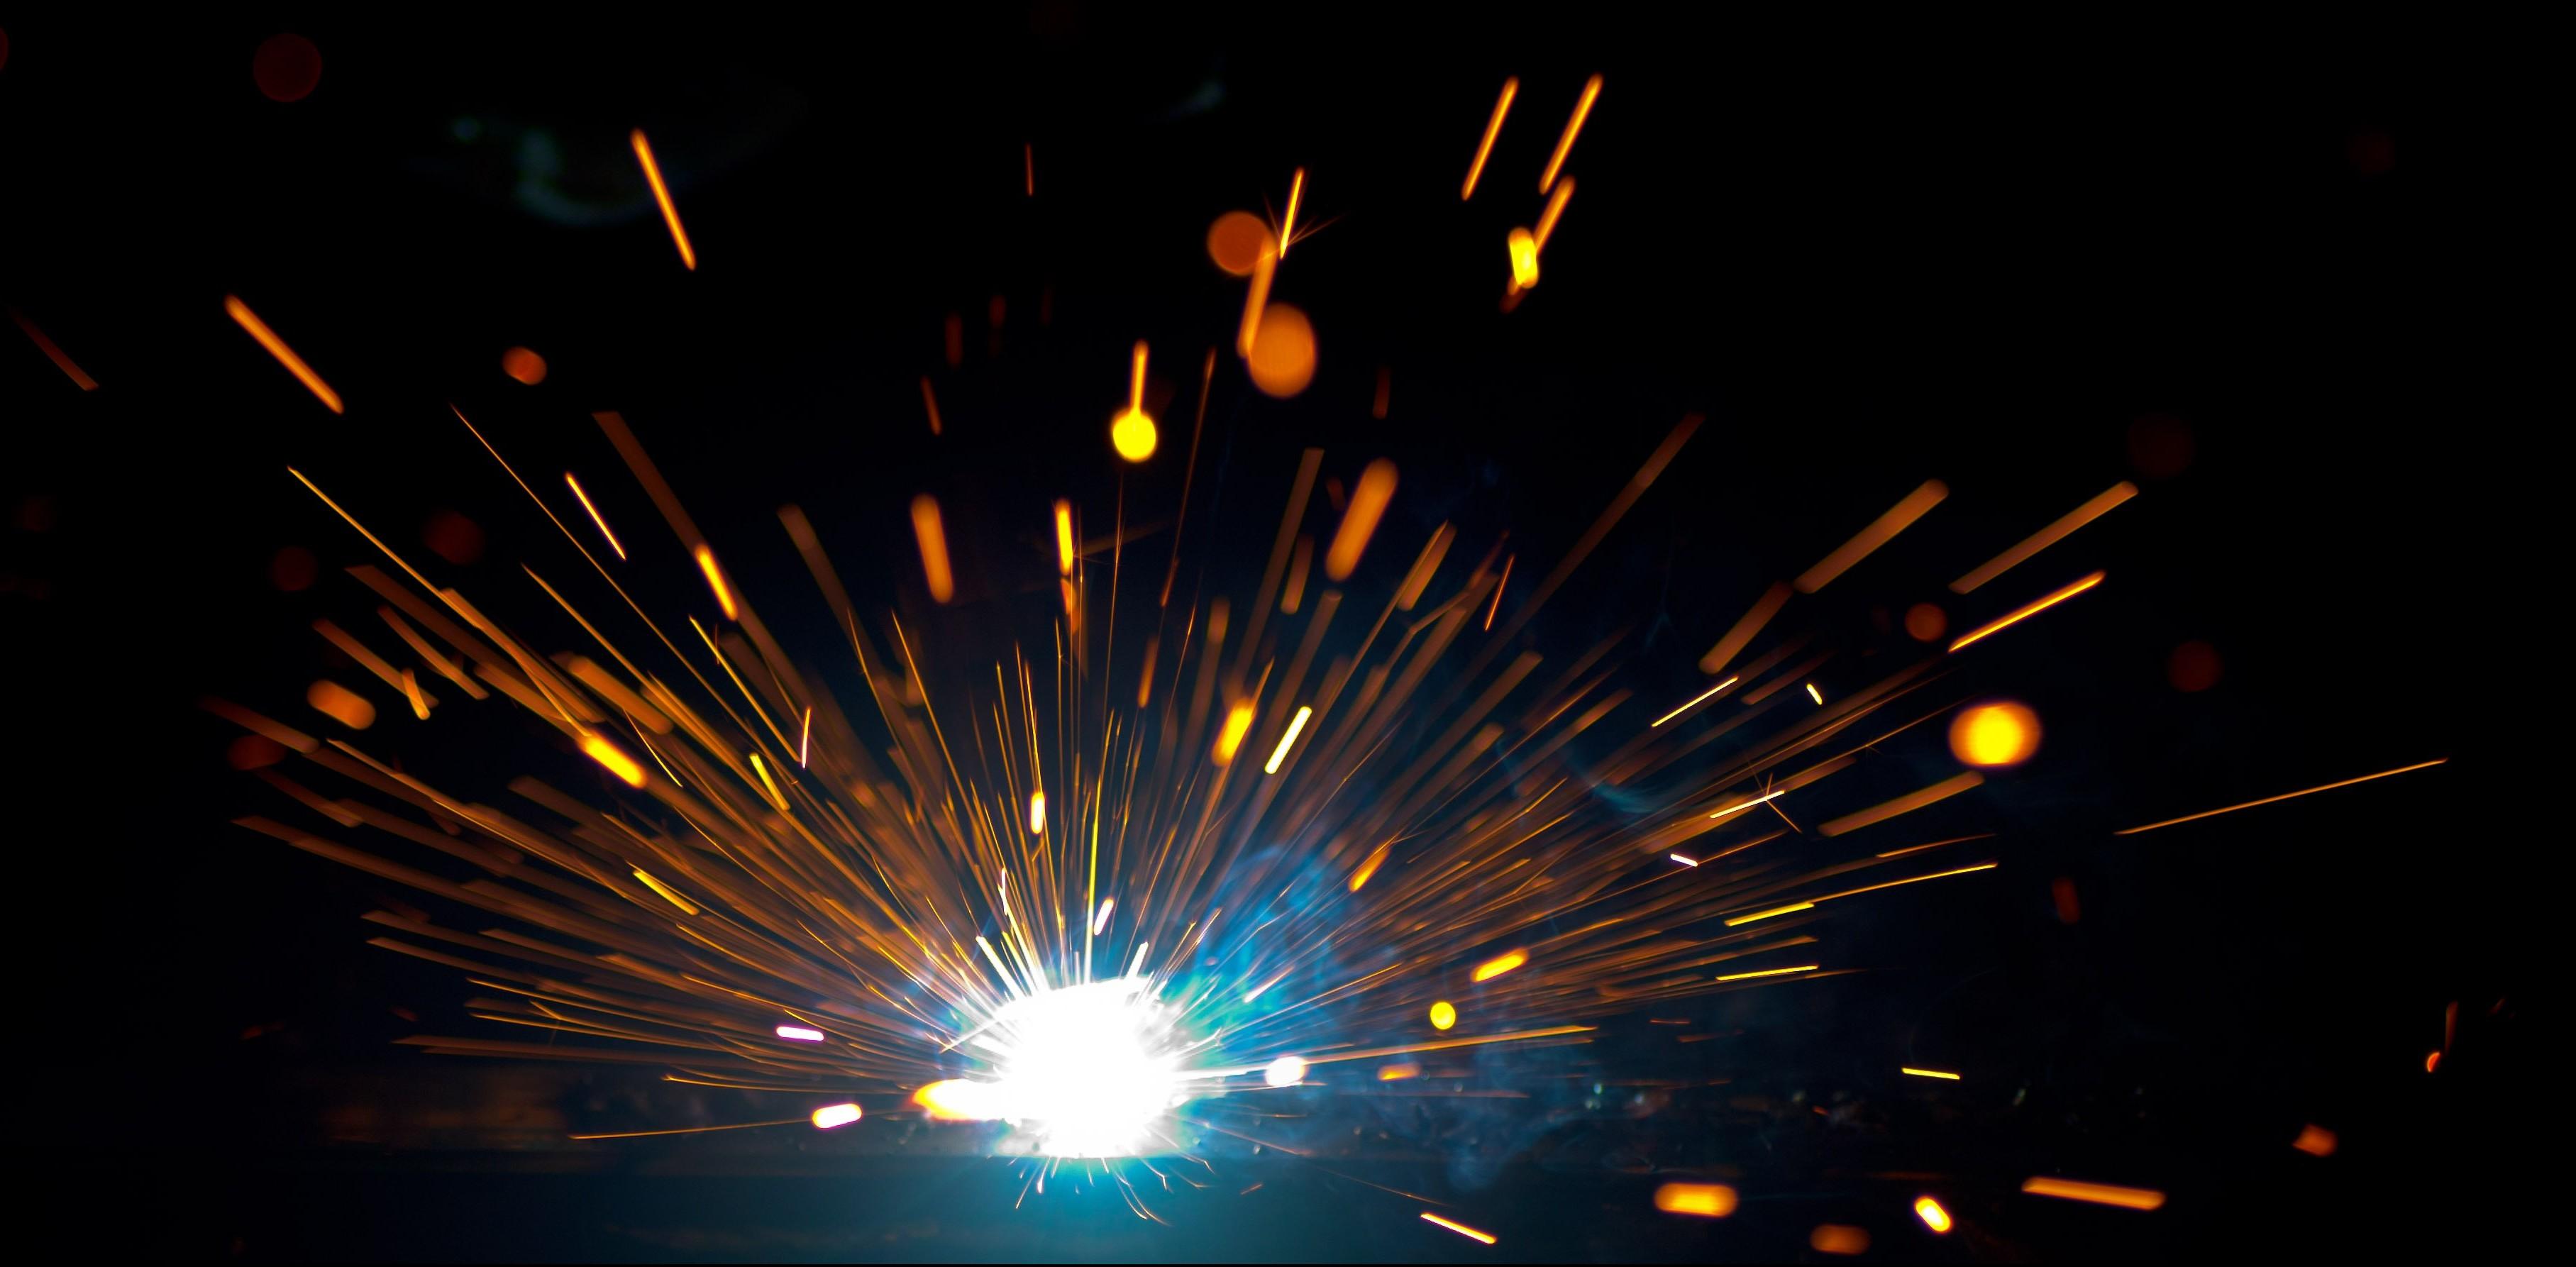 Fireworks and flying sparks